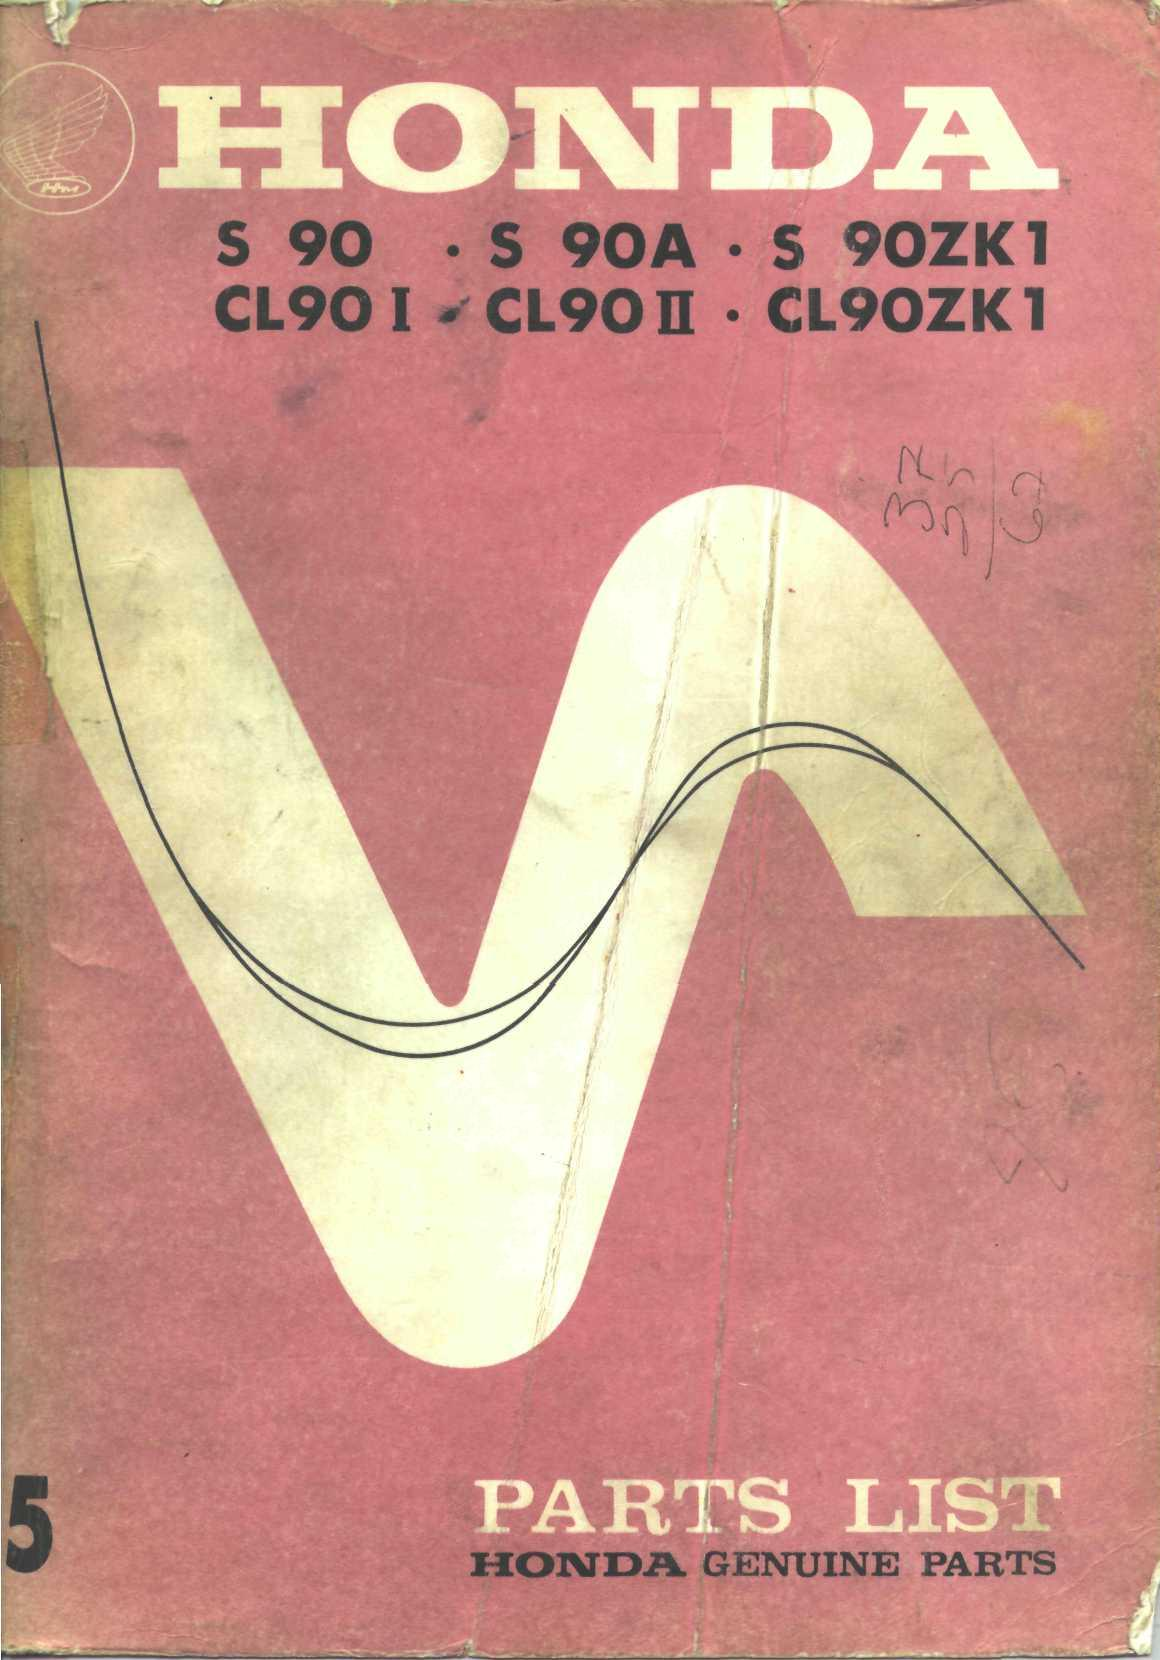 Workshopmanual for Honda S90 (1972)